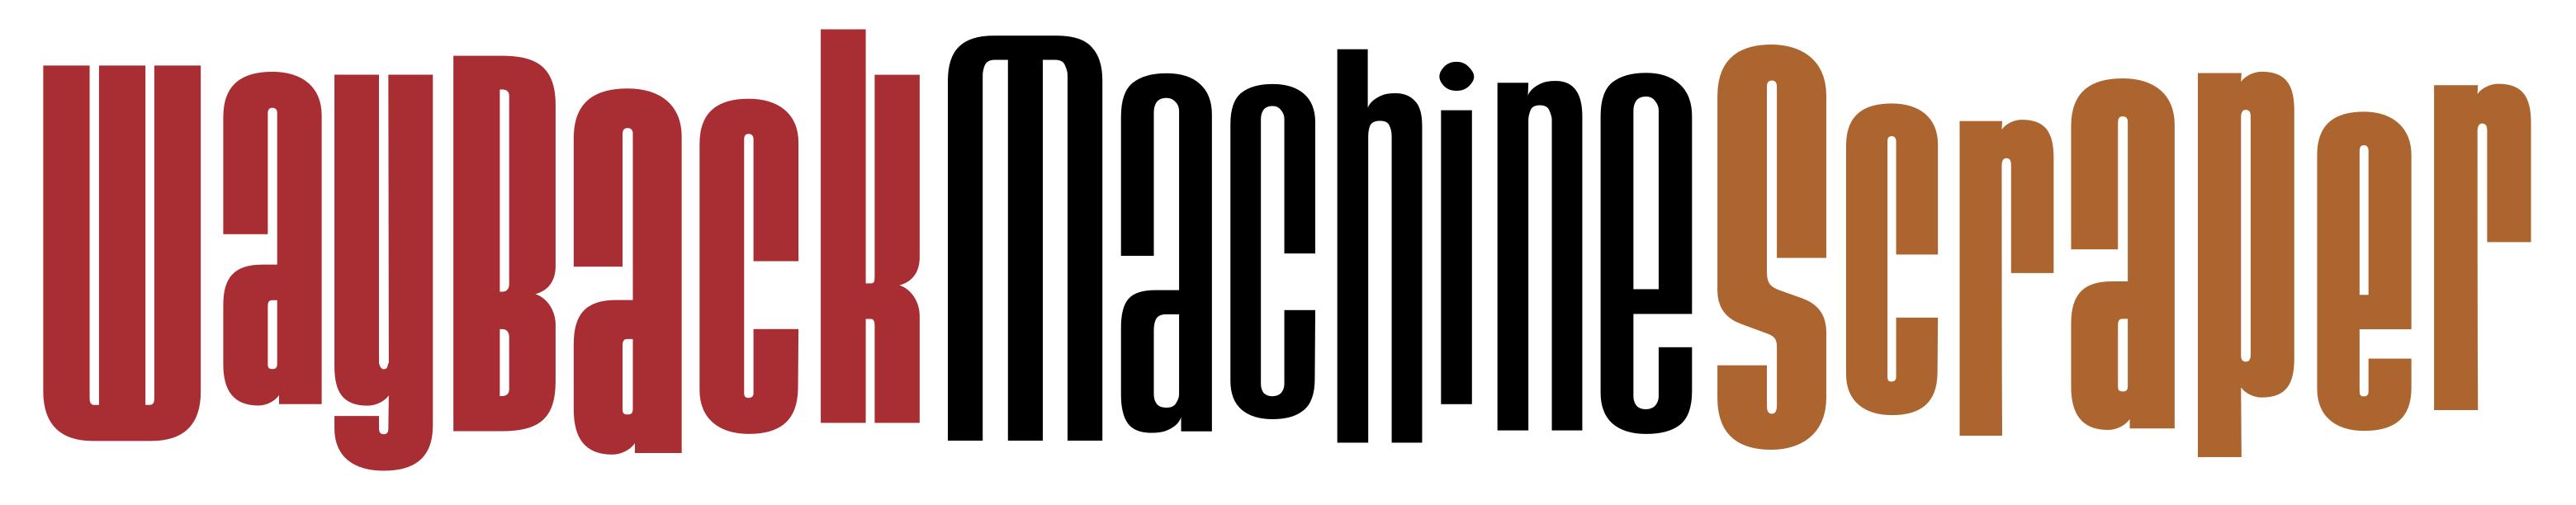 The Wayback Machine Scraper Logo